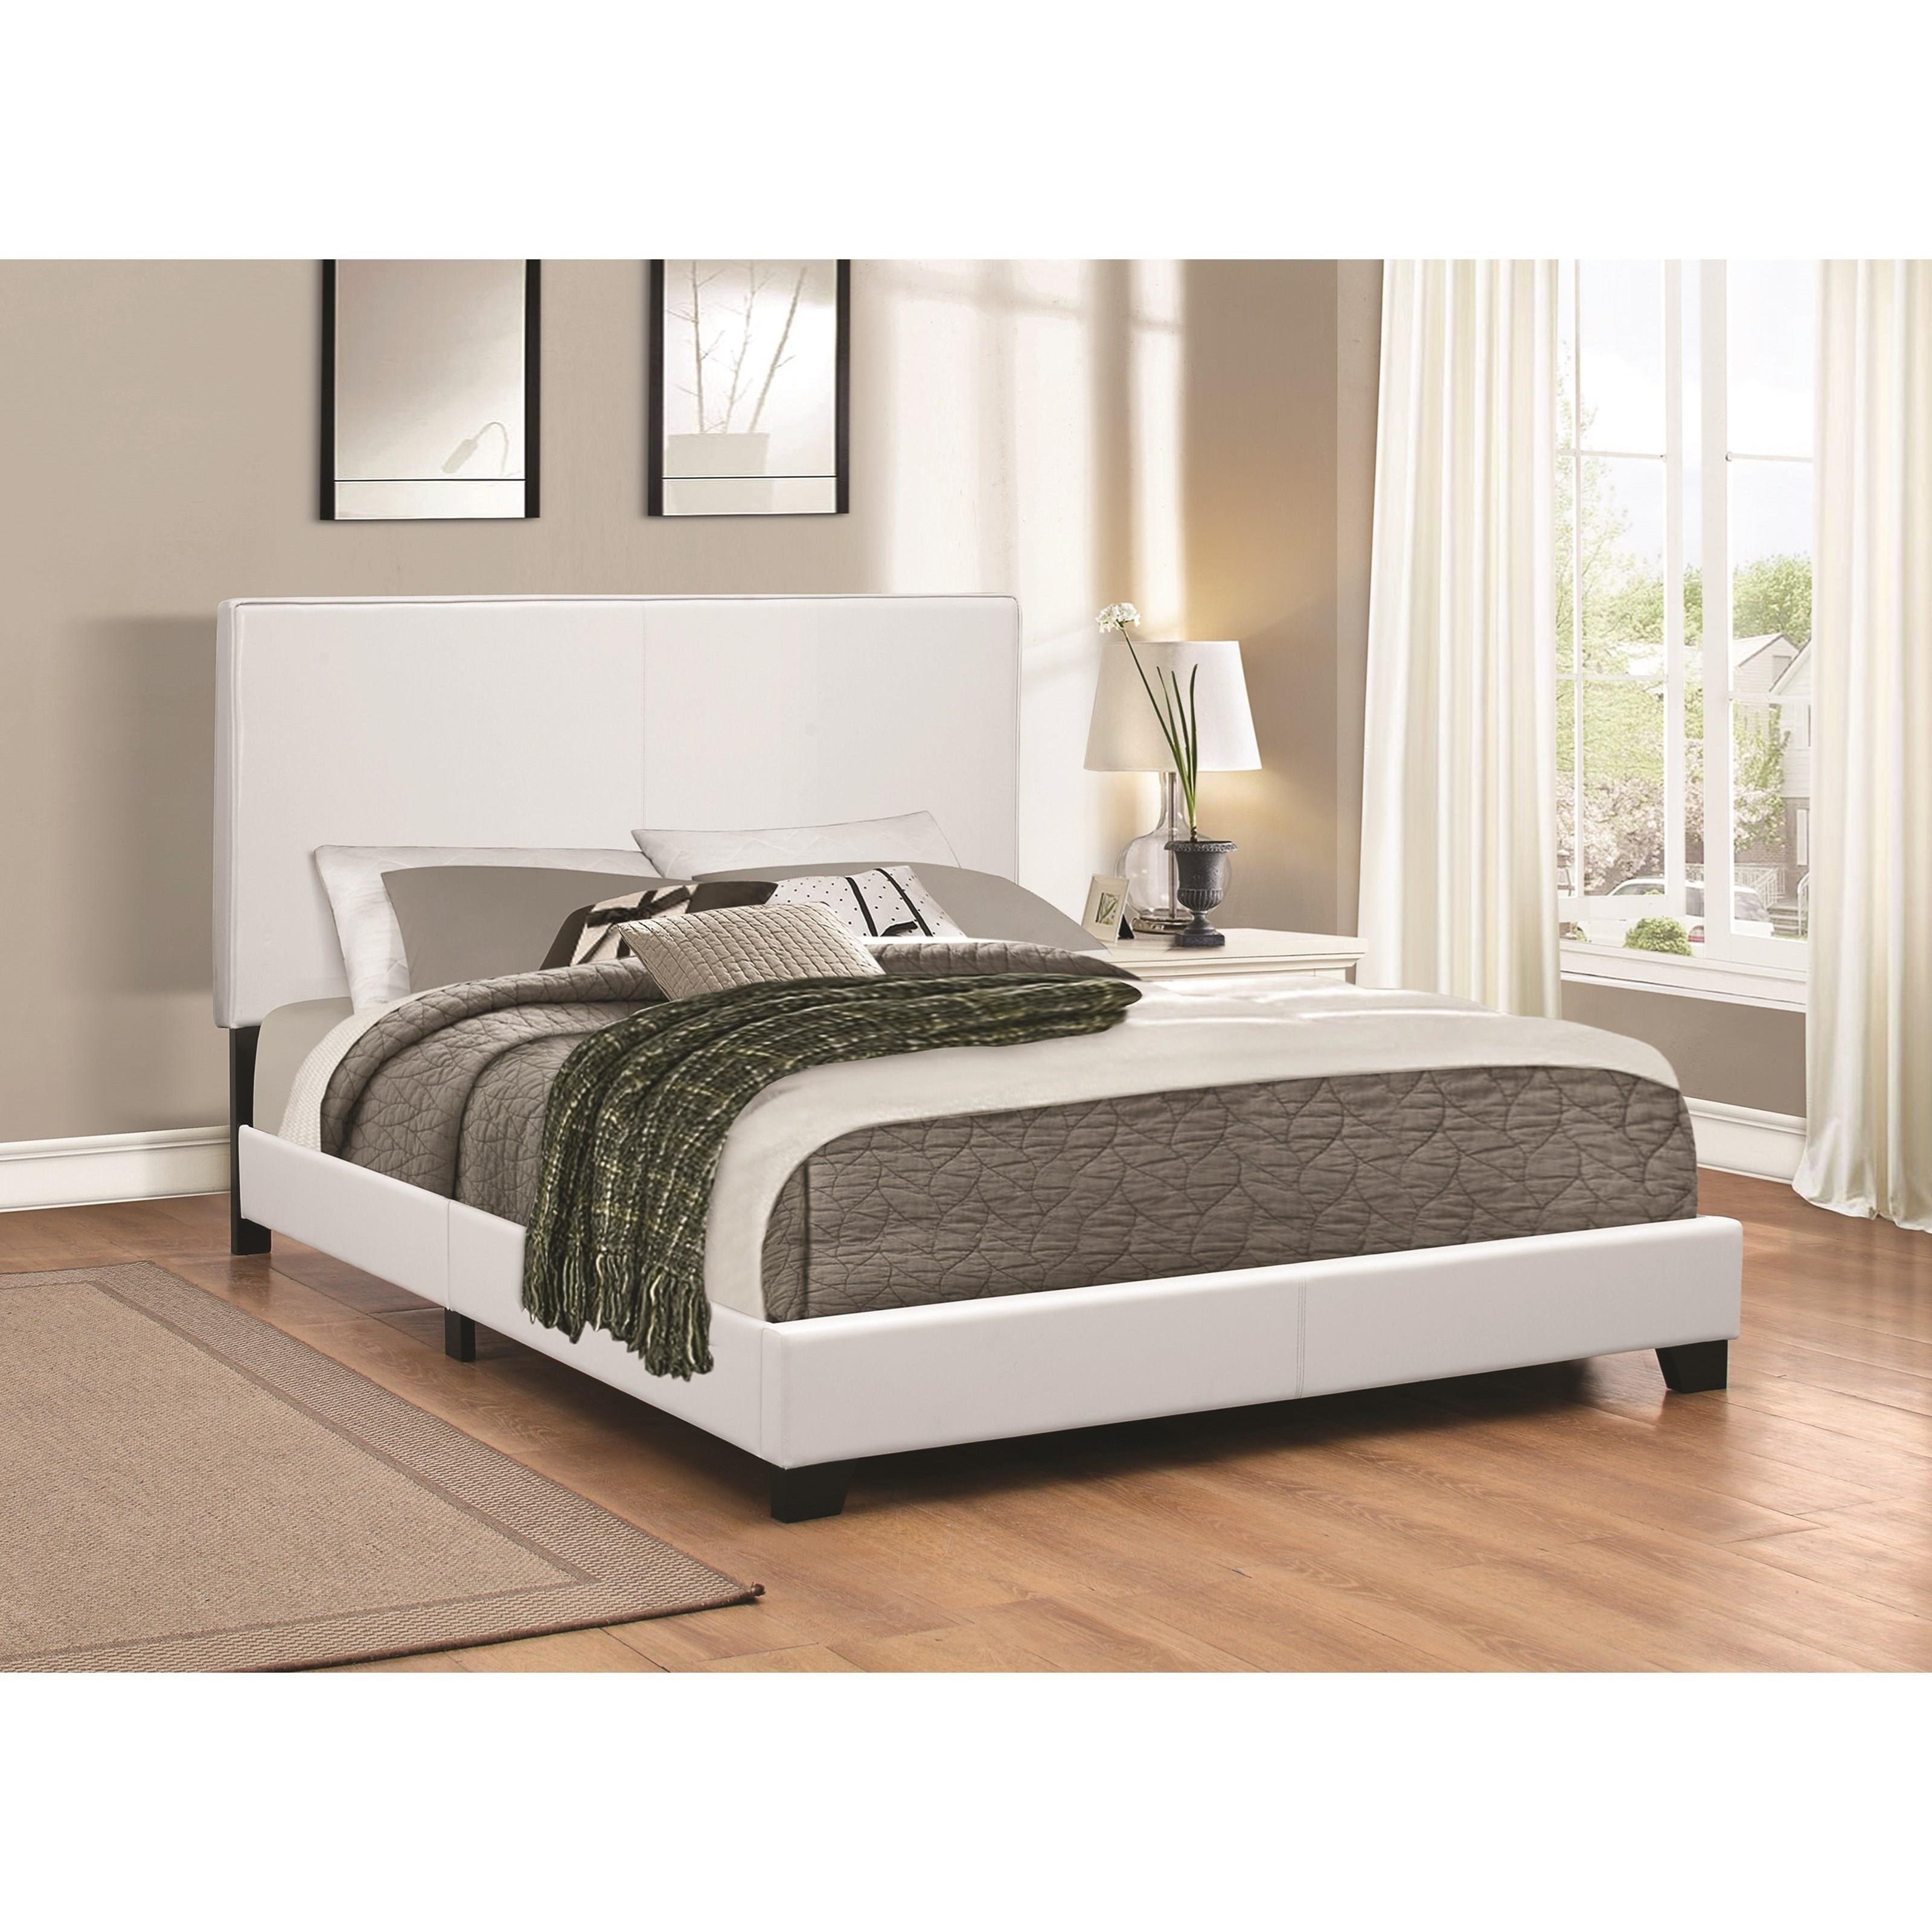 Coaster Upholstered Beds Full Bed - Item Number: 300559F